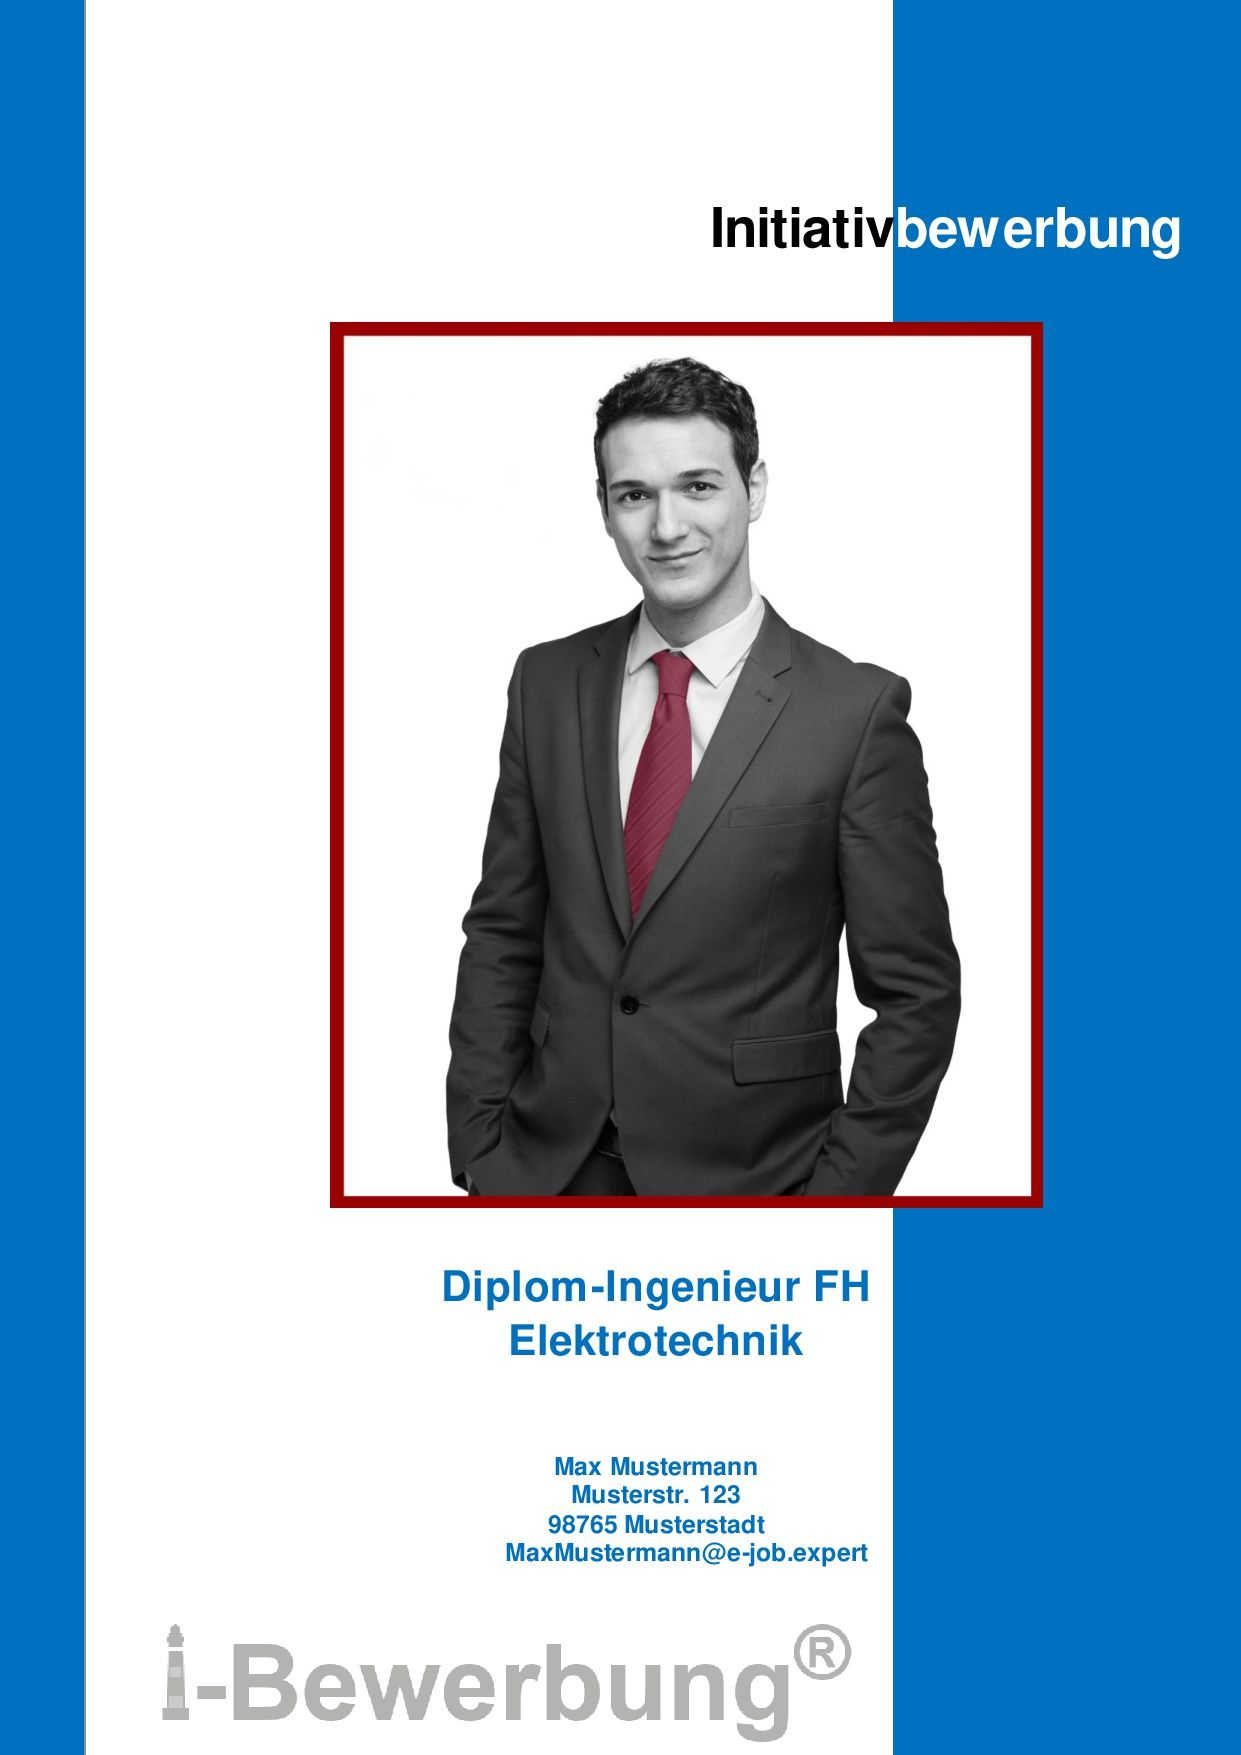 Deckblatt Initiativbewerbung Diplom Ingenieur Deckblatt Bewerbung Deckblatt Diplom Ingenieur